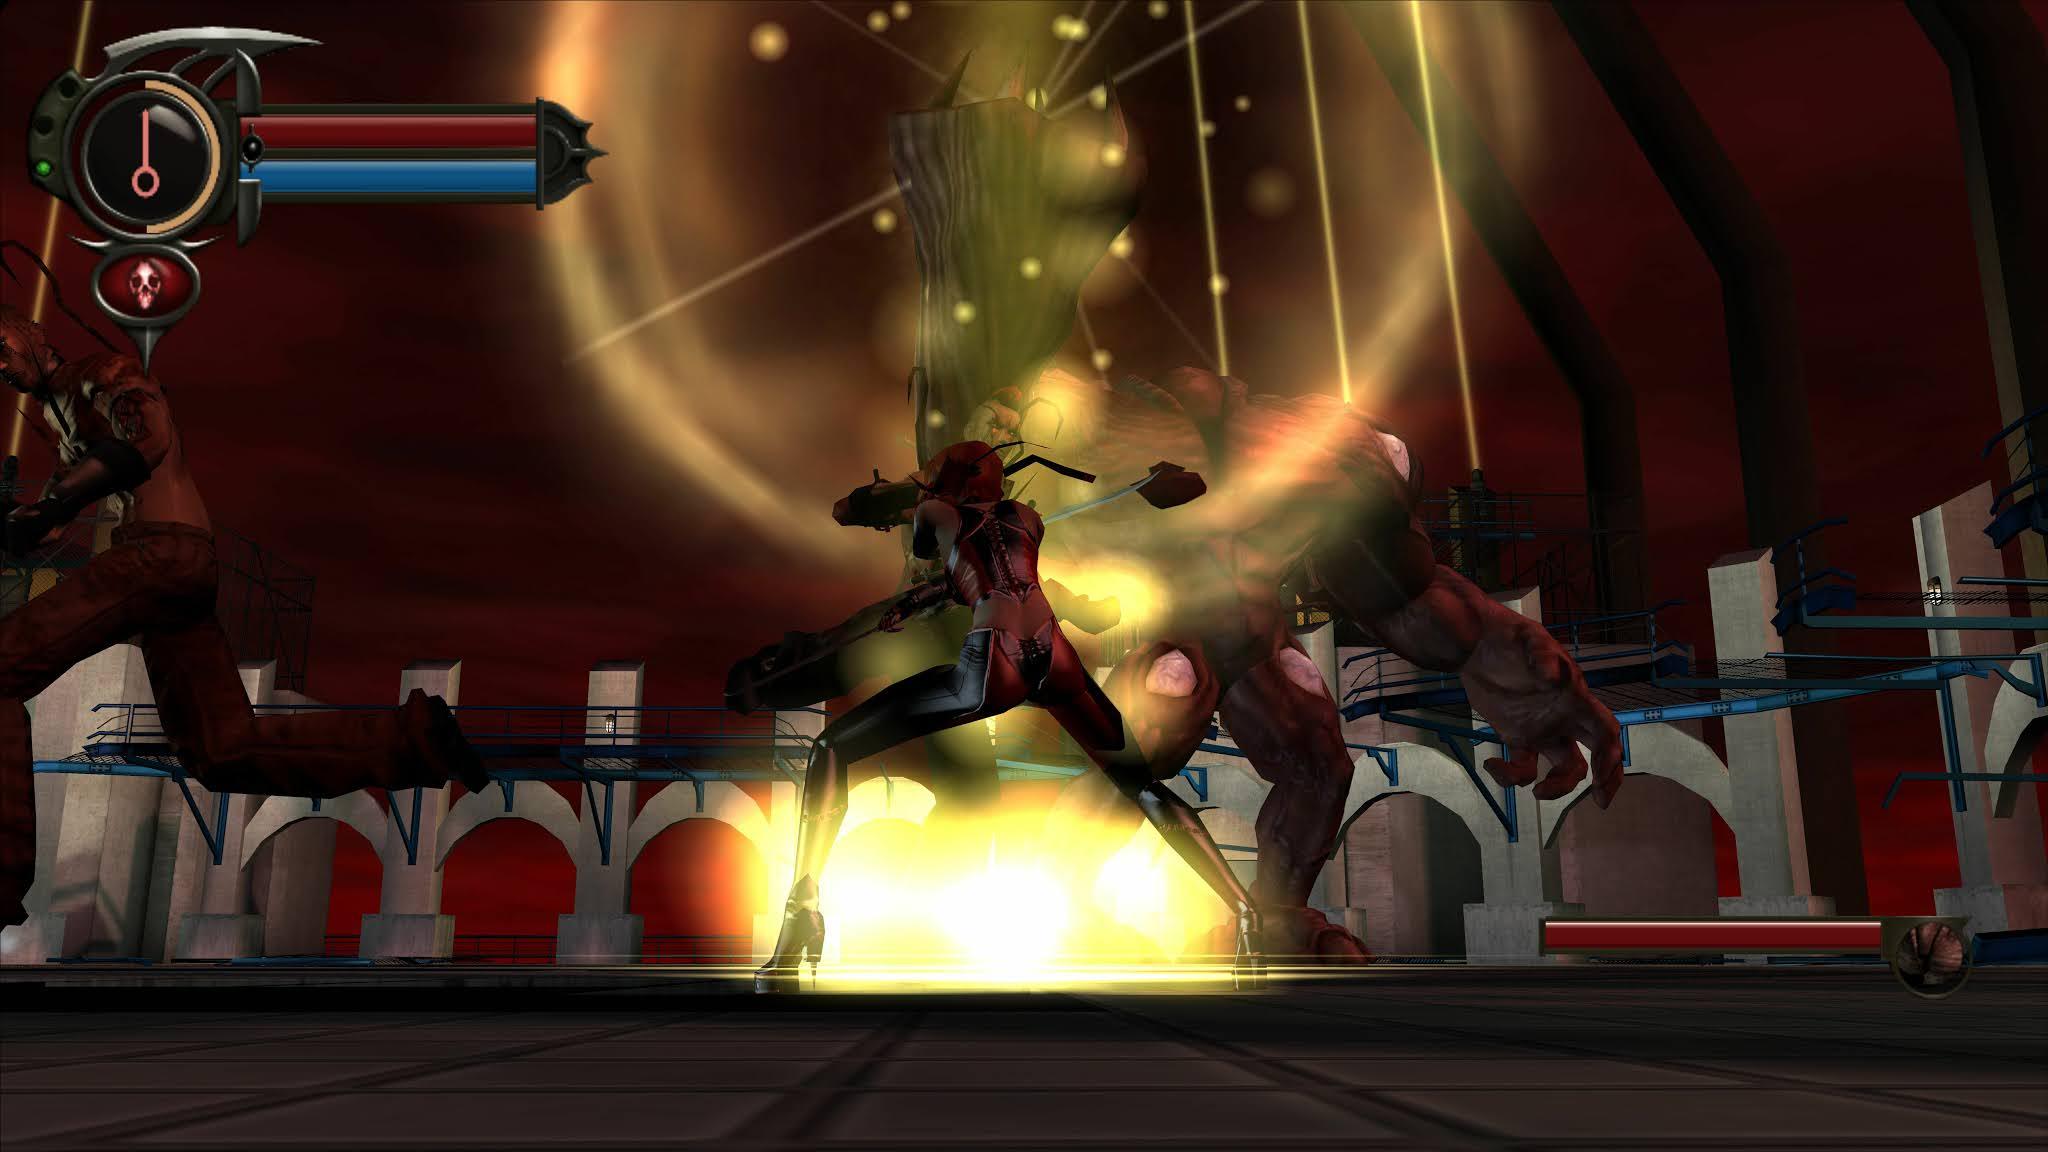 bloodrayne-2-terminal-cut-pc-screenshot-04